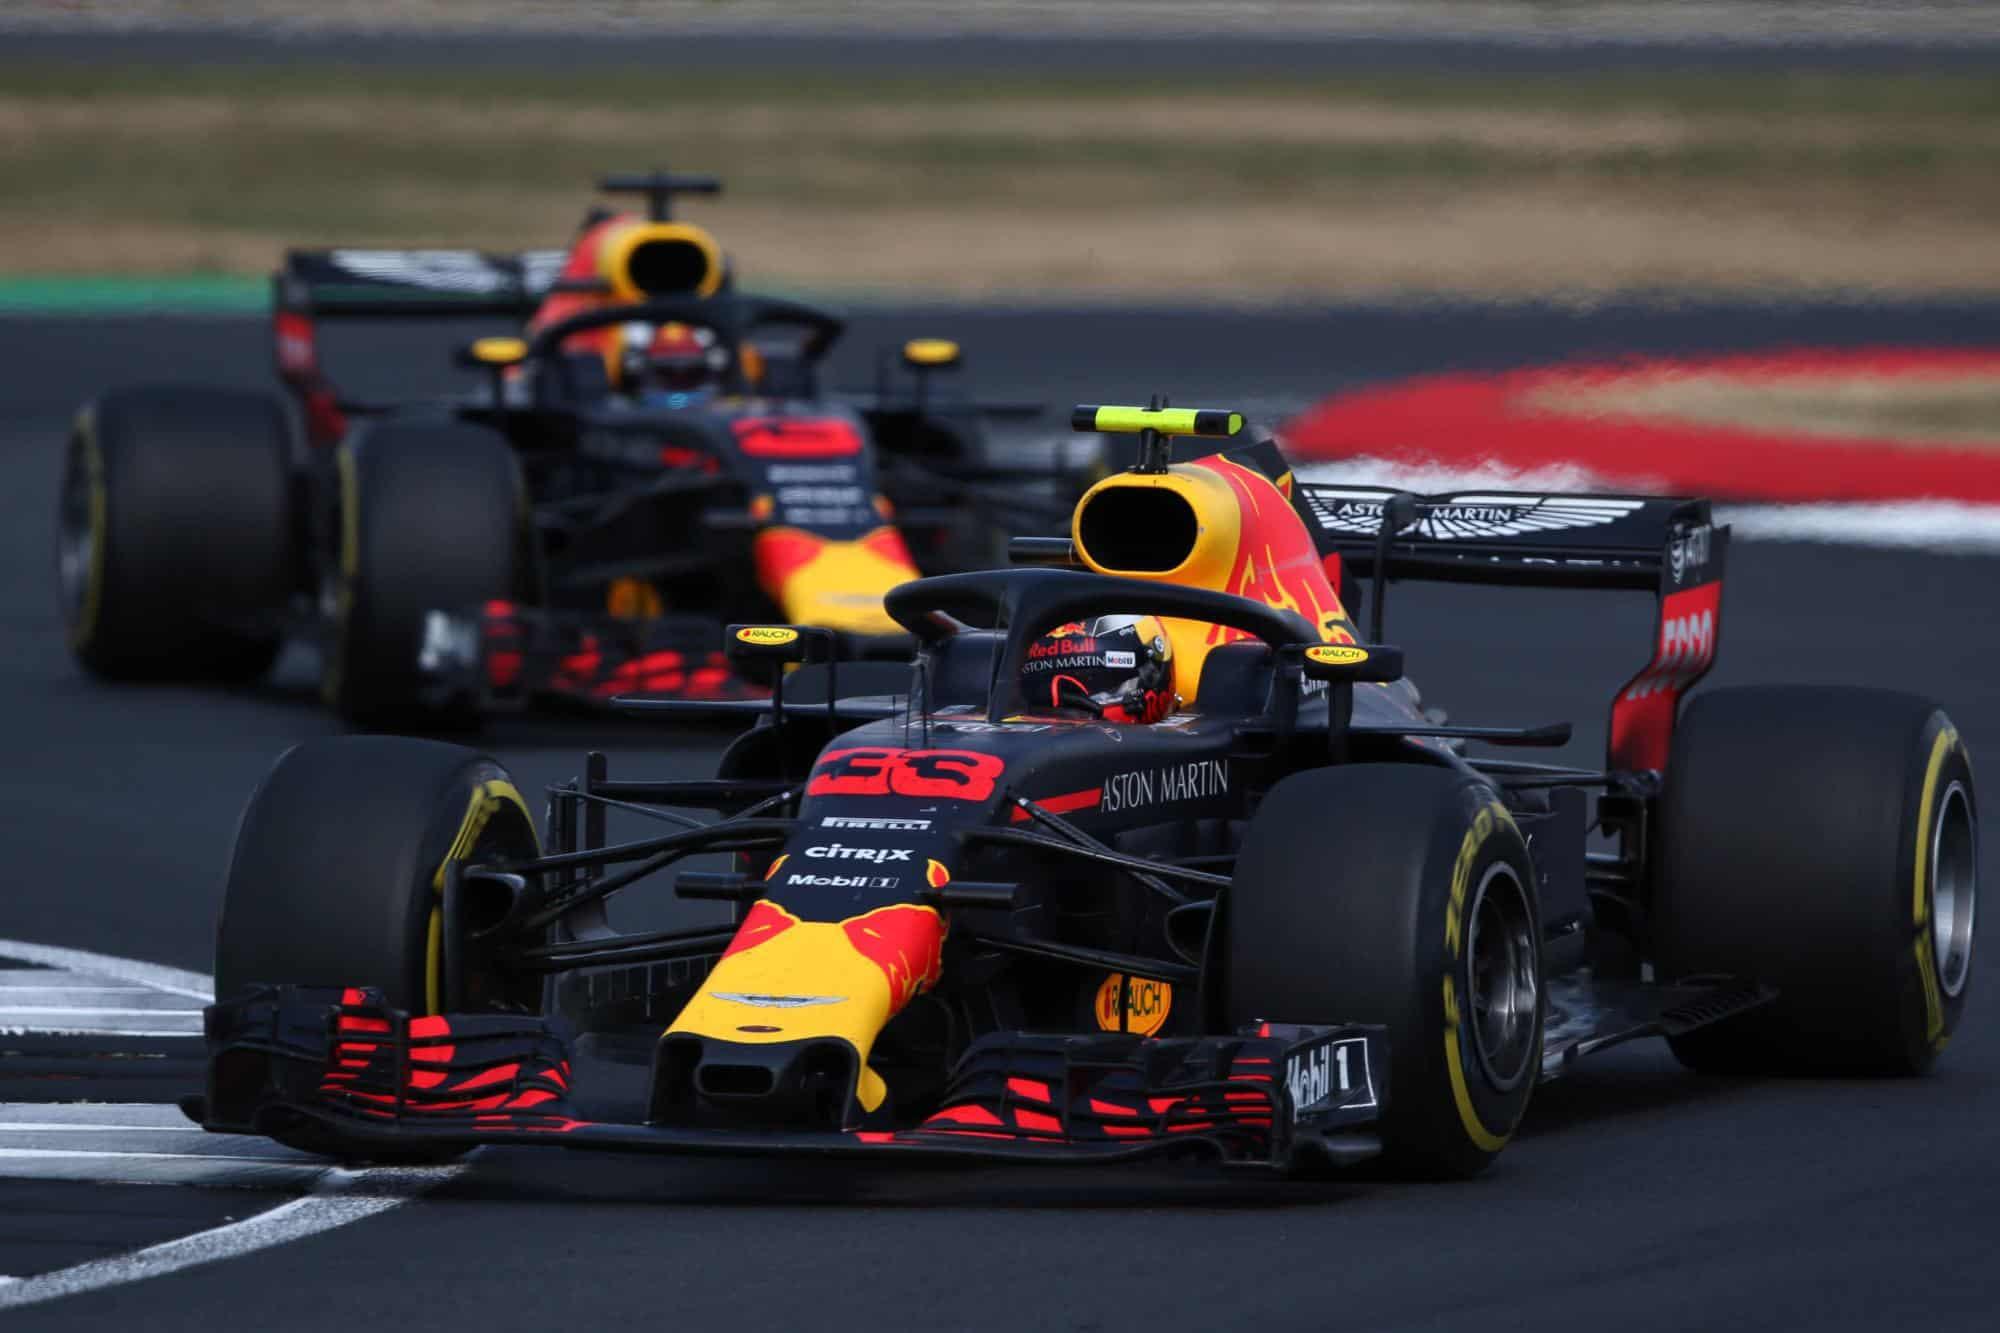 Verstappen leads Ricciardo British GP F1 2018 Photo Red Bull